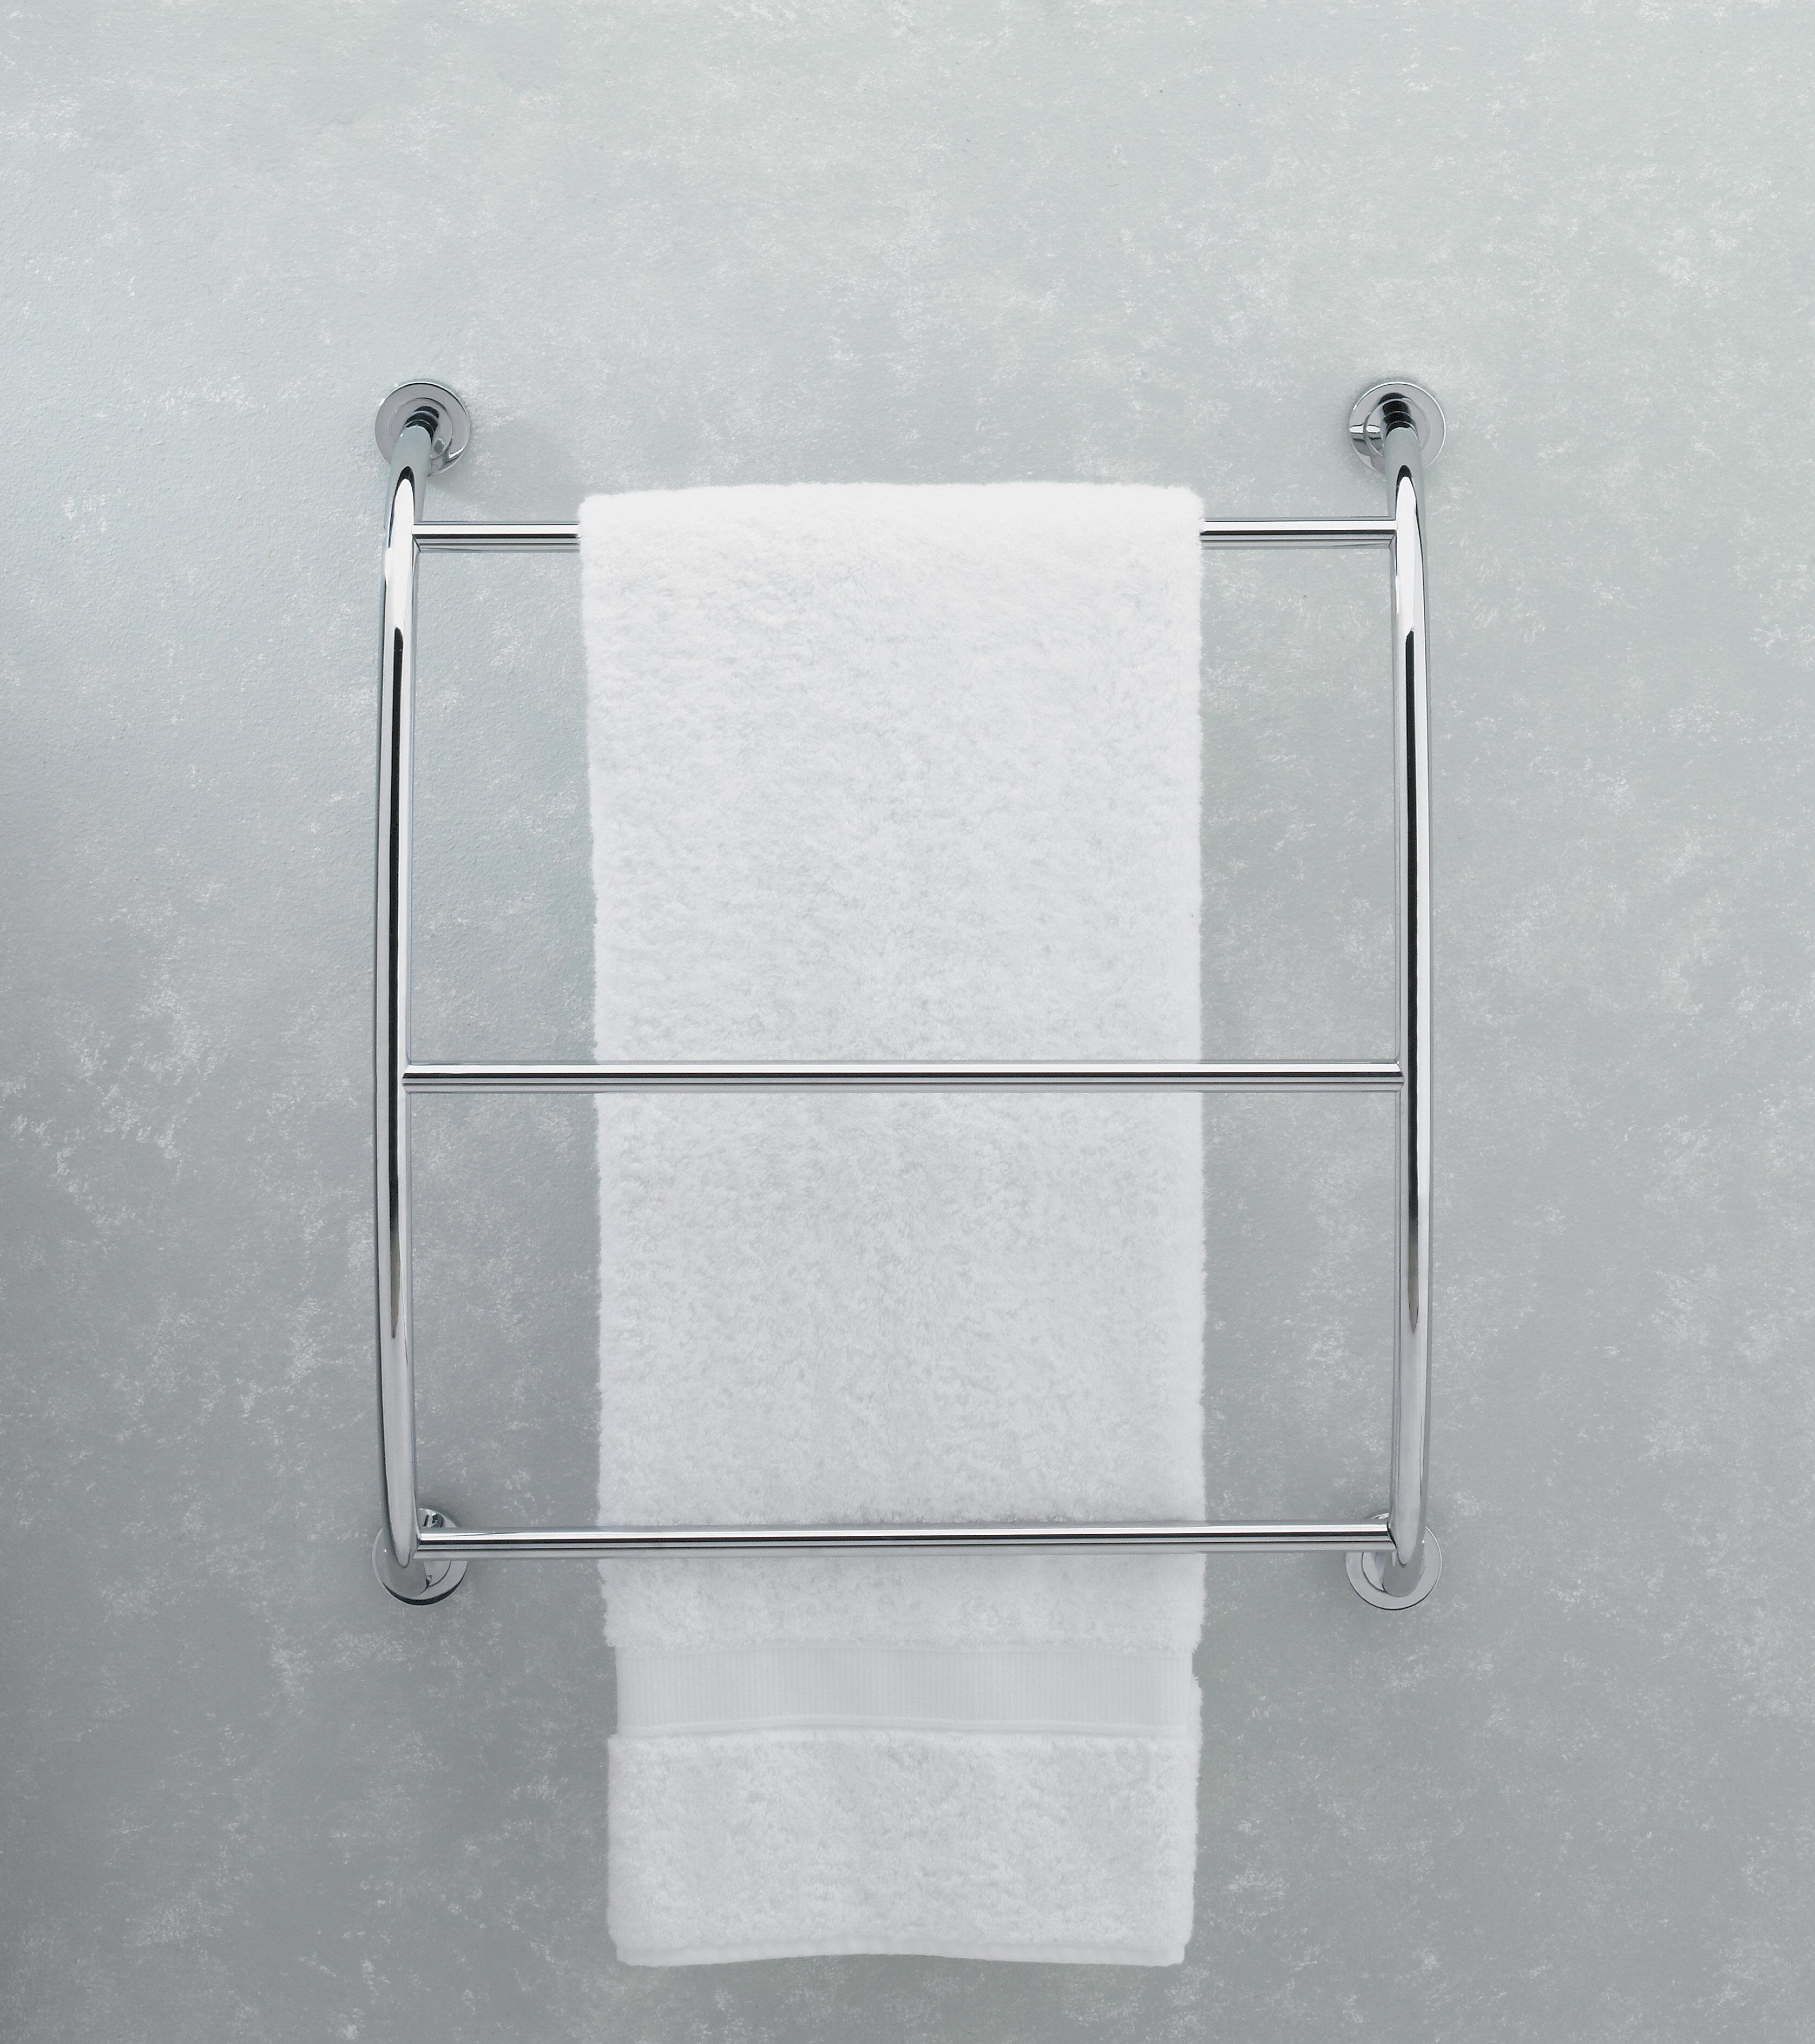 Valsan Essentials Wall Mounted Towel Rack | Wayfair